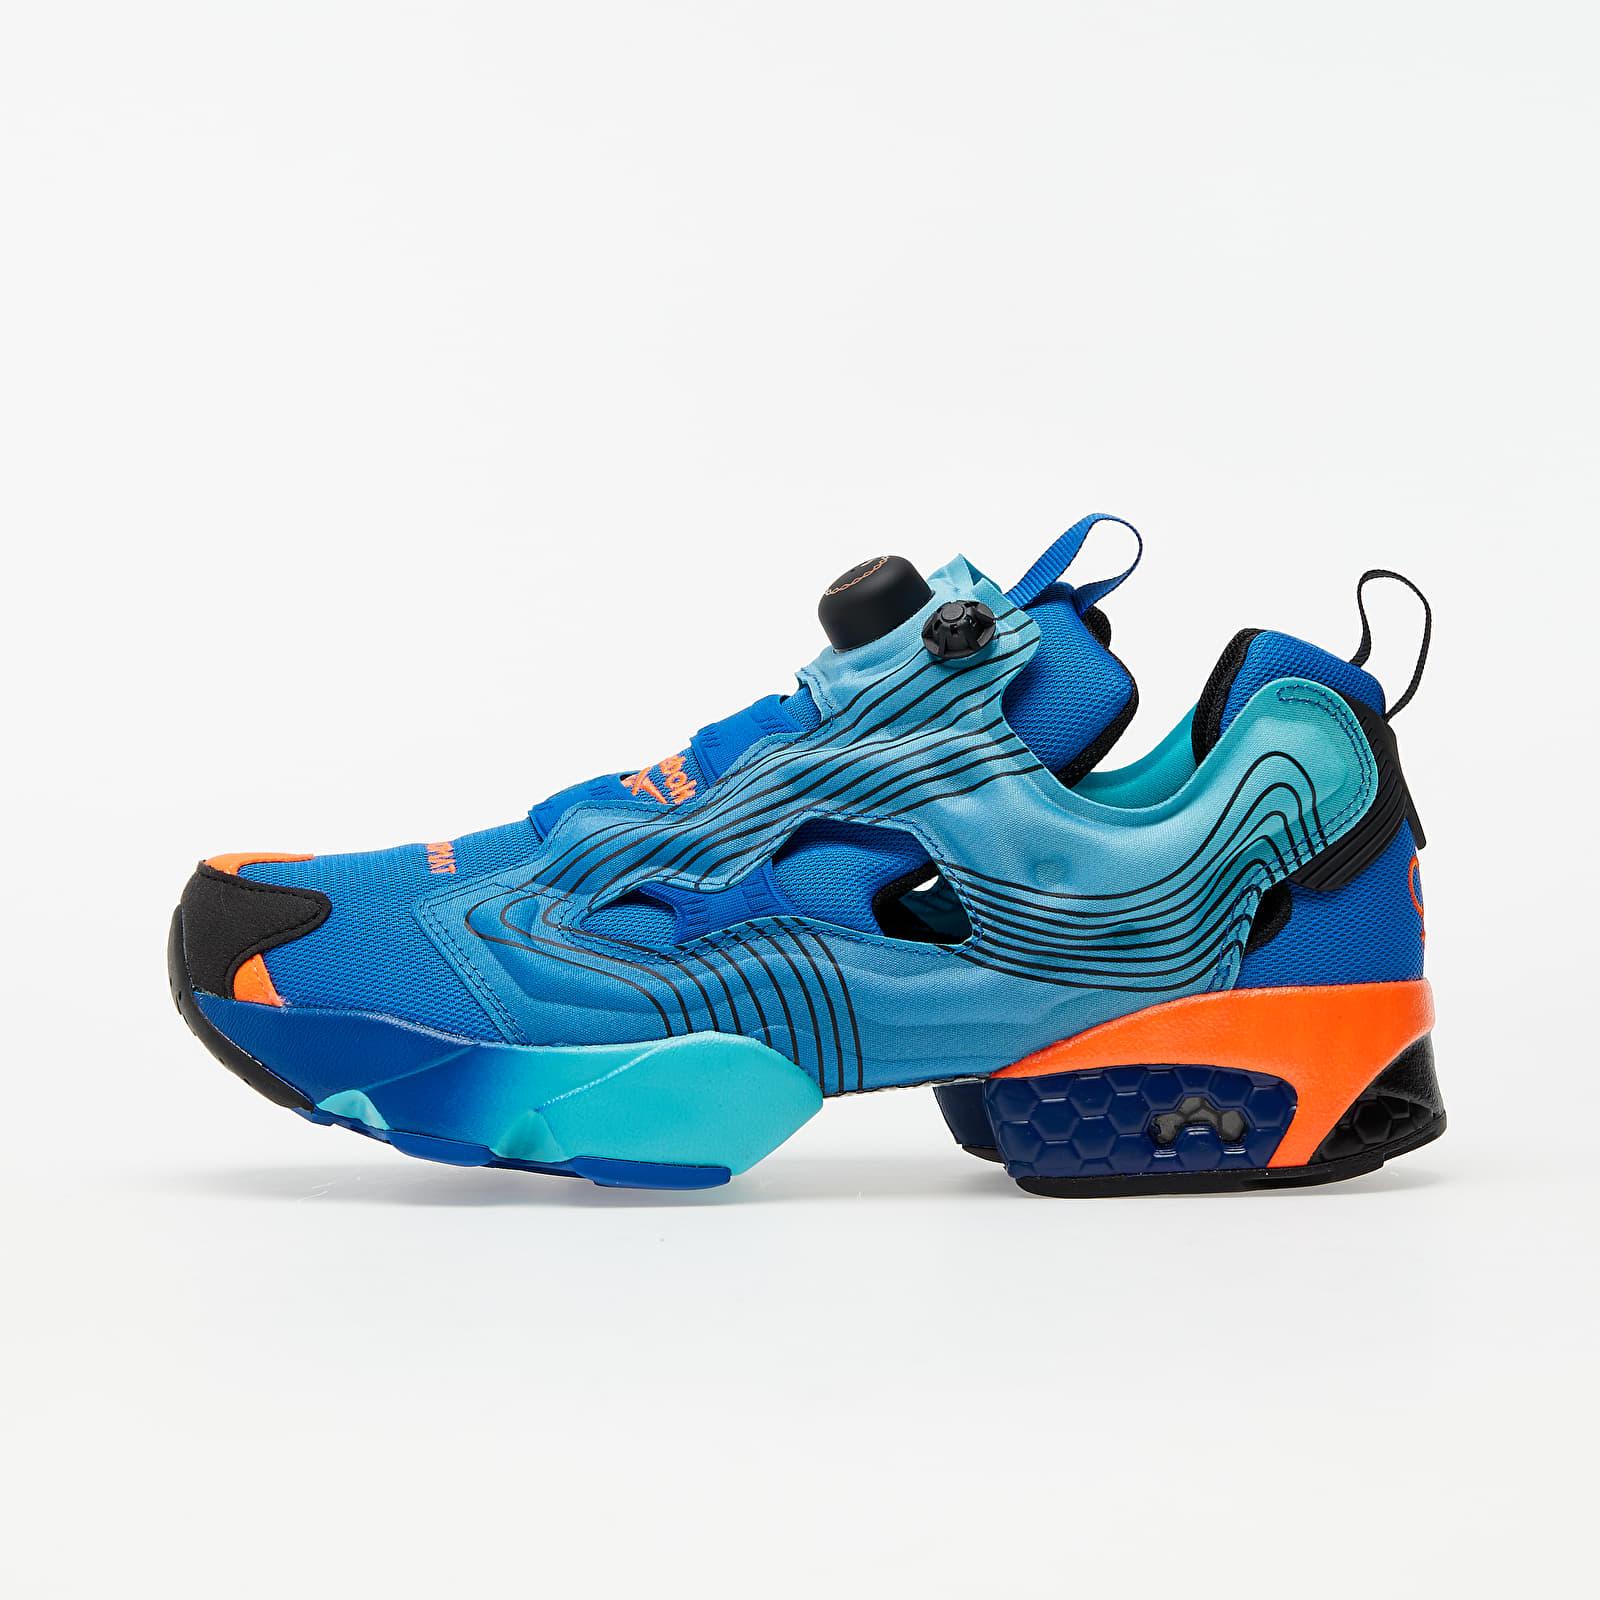 Chaussures et baskets homme Reebok Instapump Fury Vector Blue/ Glam Blue/ Black